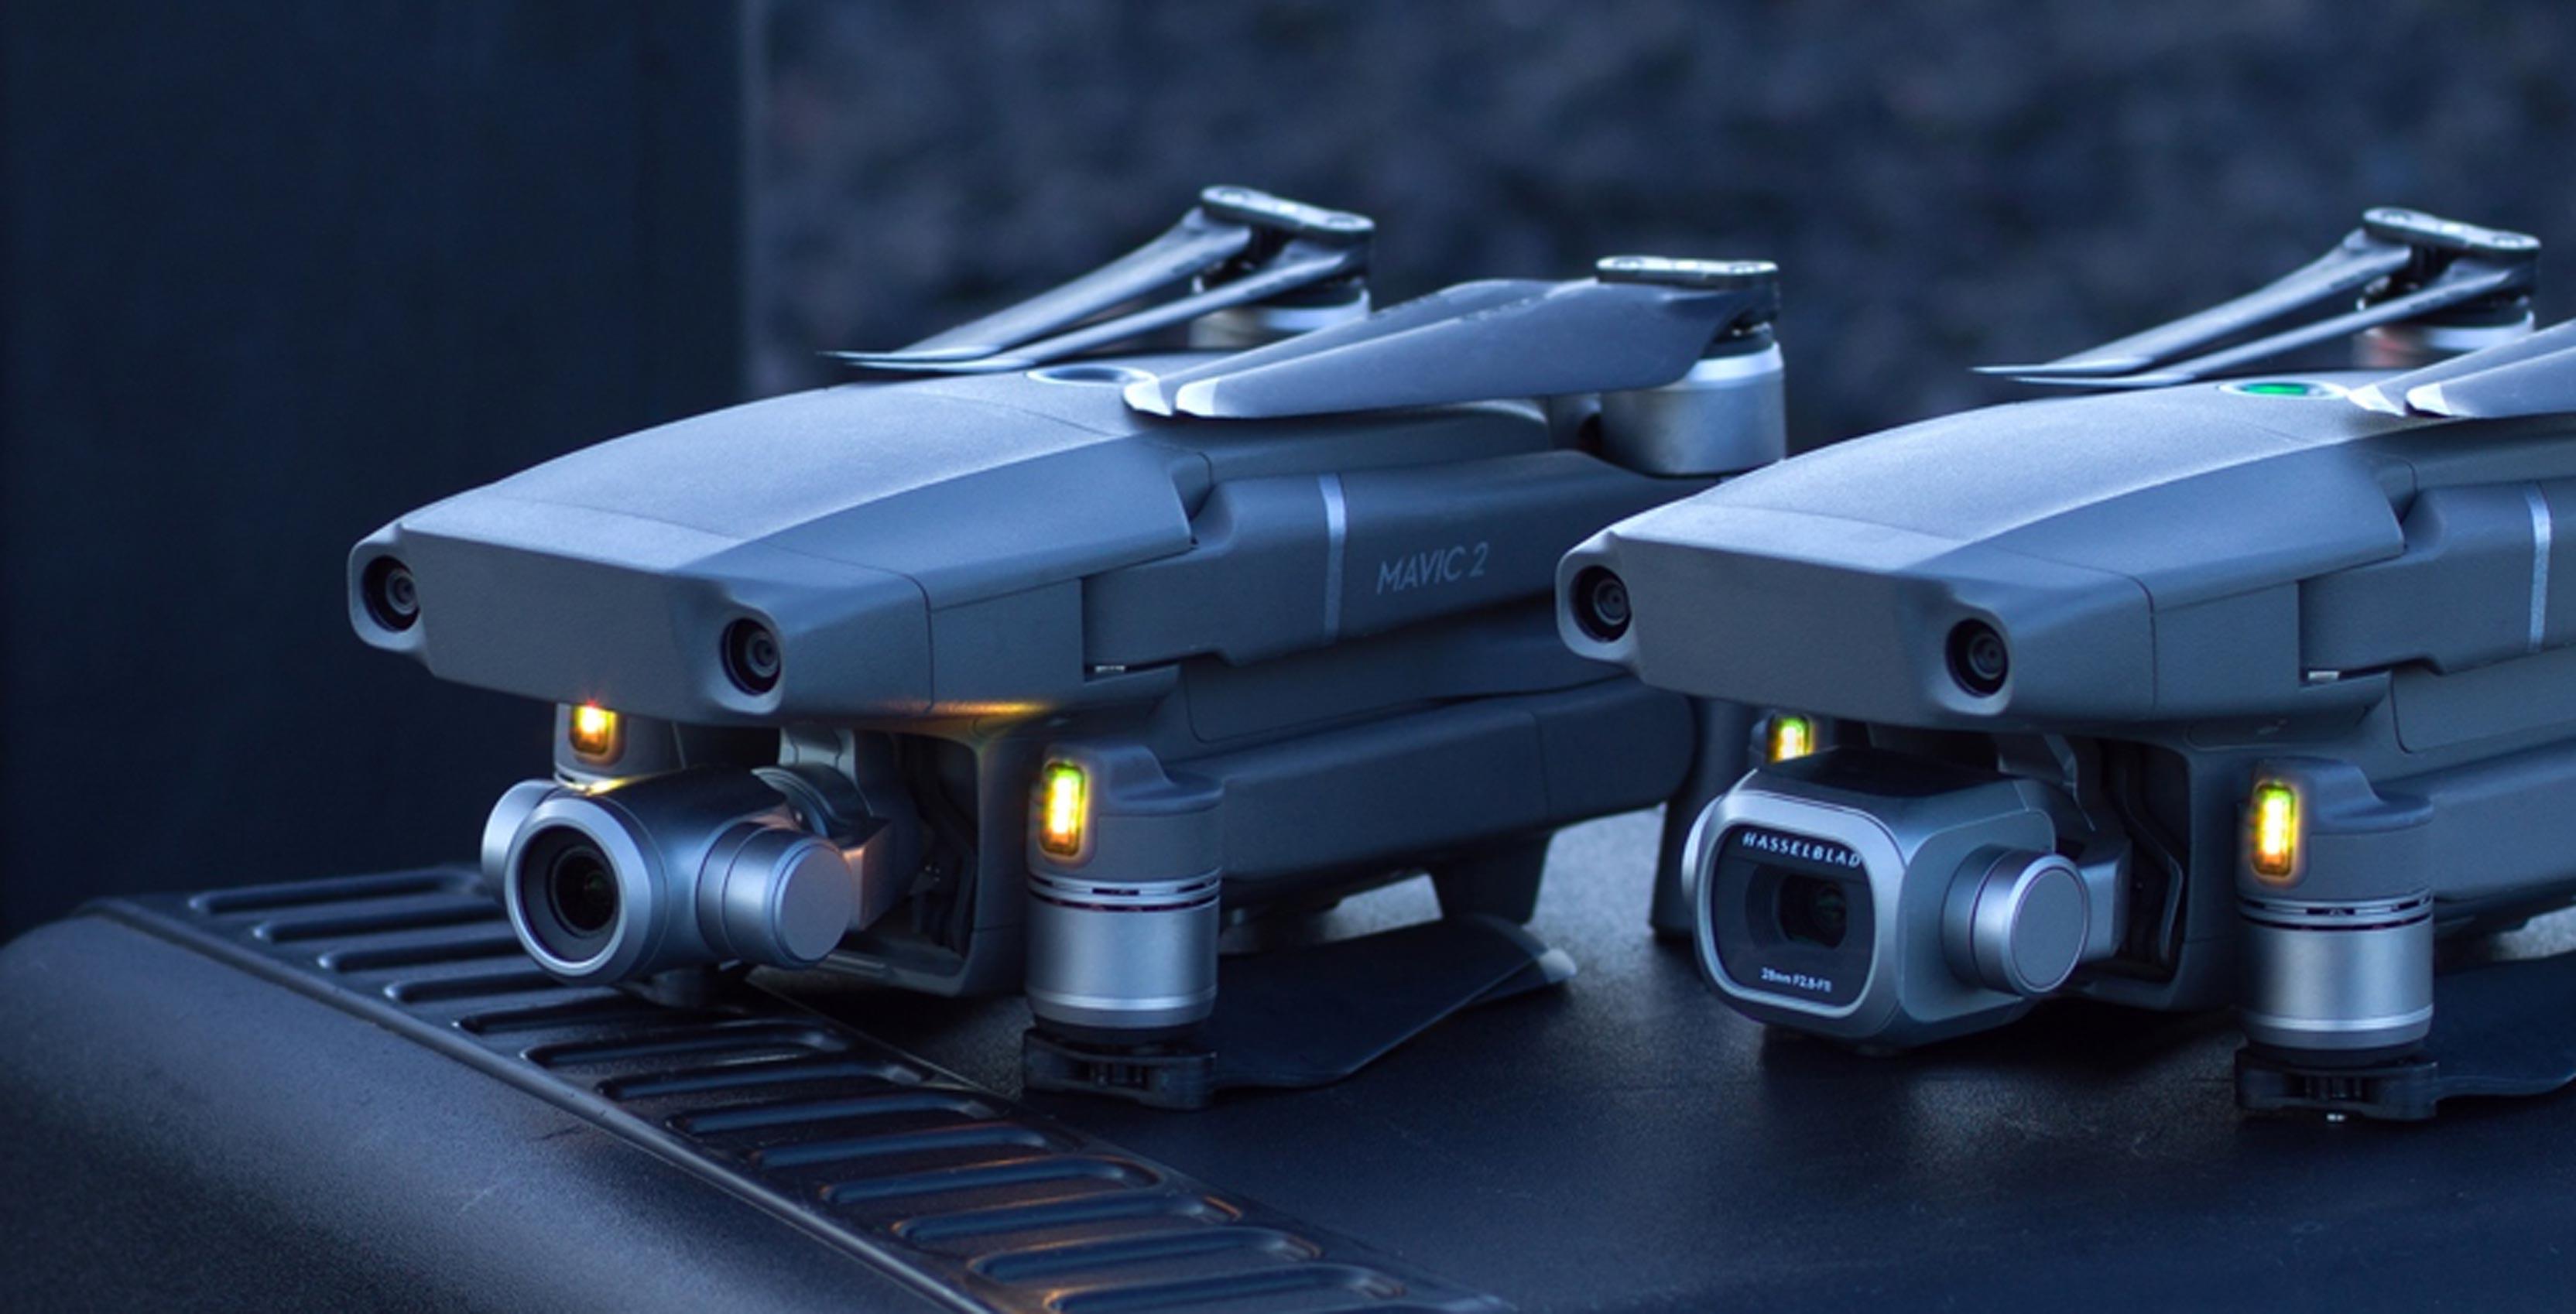 DJI introduces Mavic 2 Pro and Mavic 2 Zoom prosumer drones